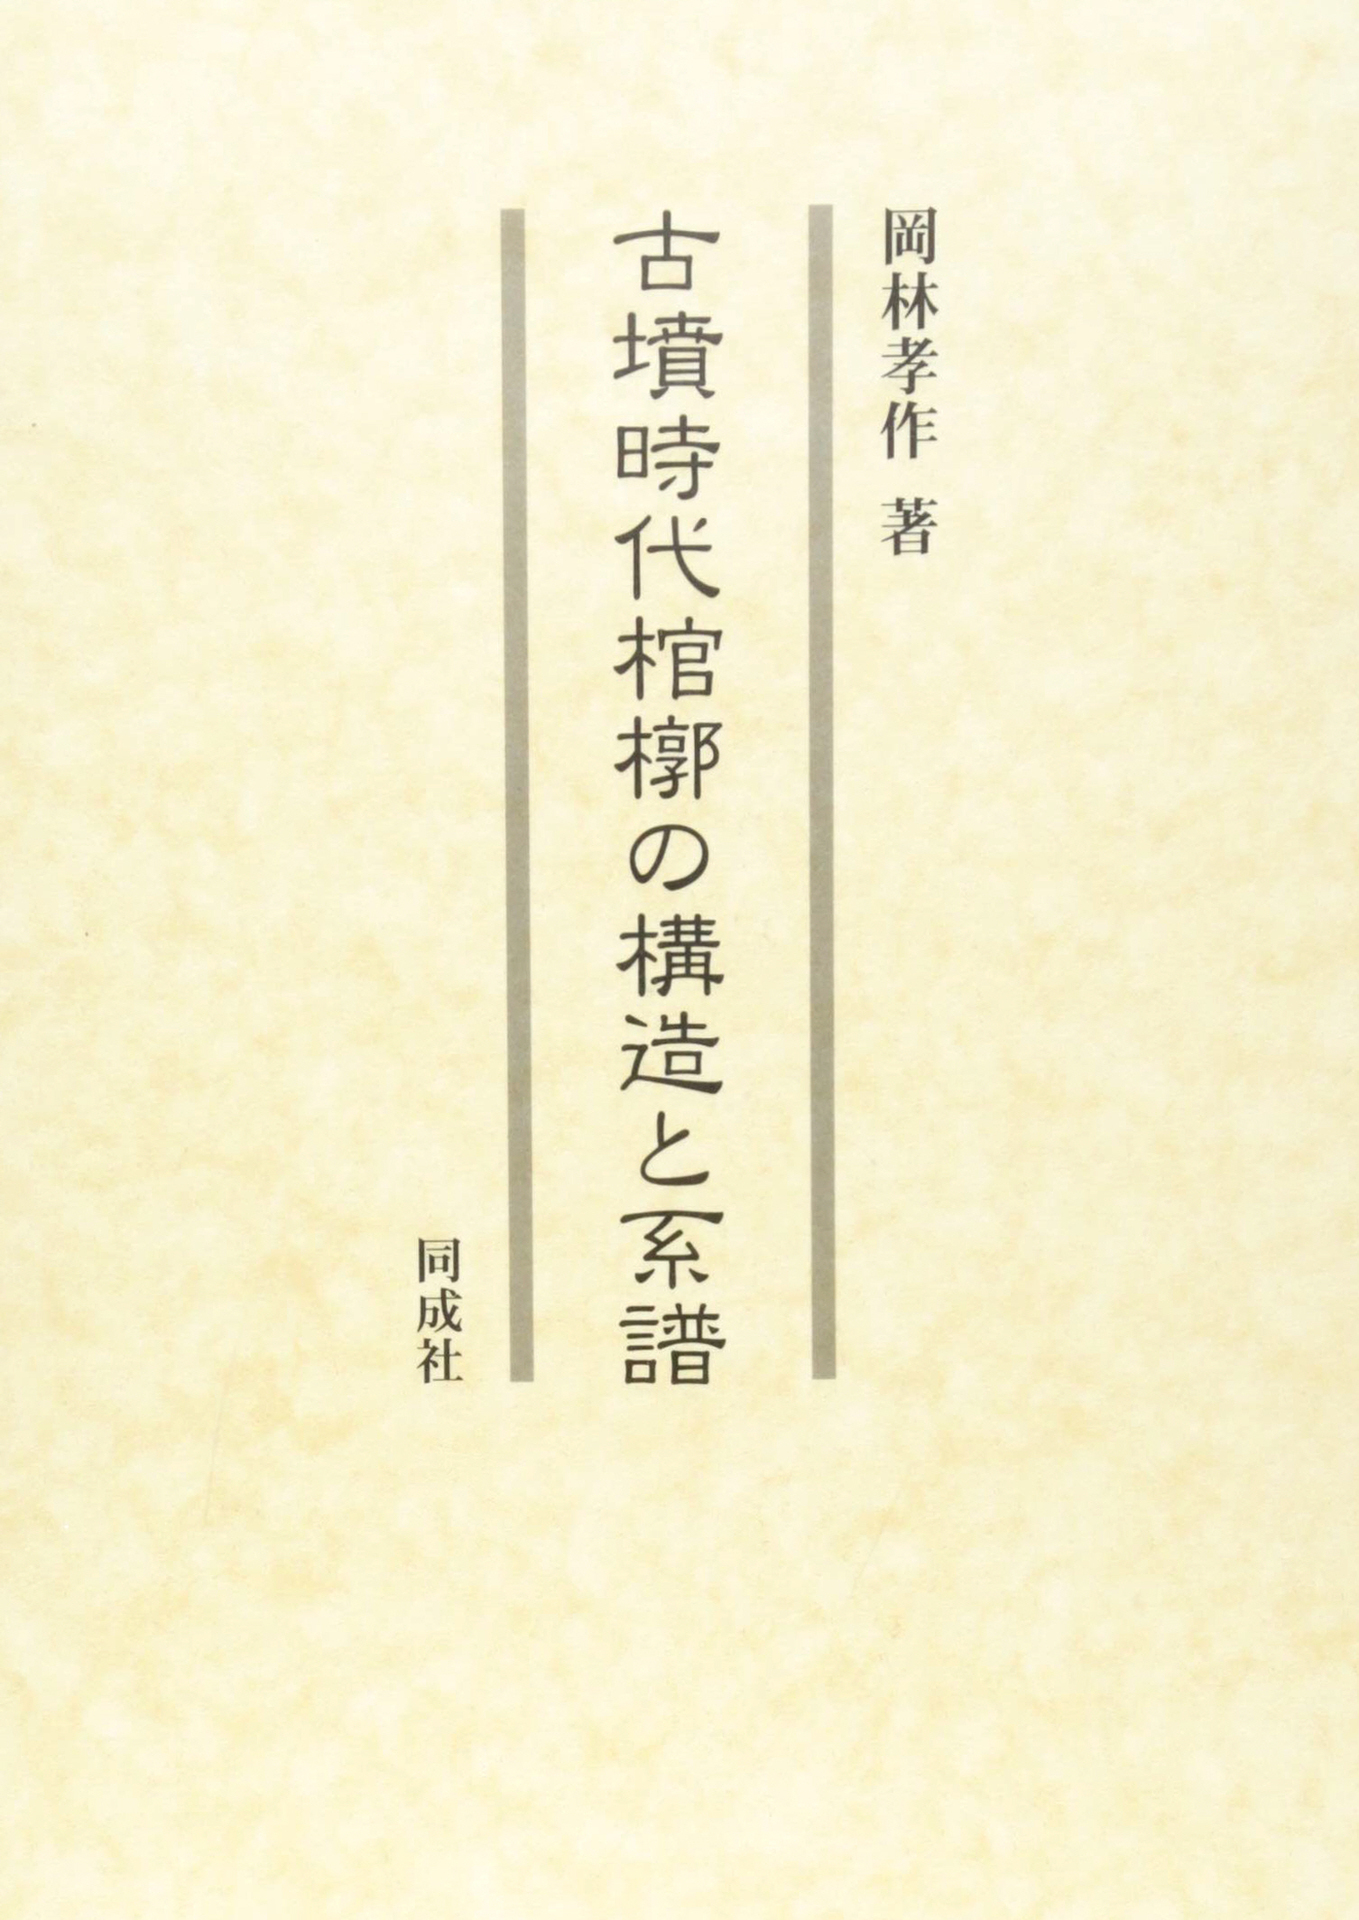 p1123231.jpg